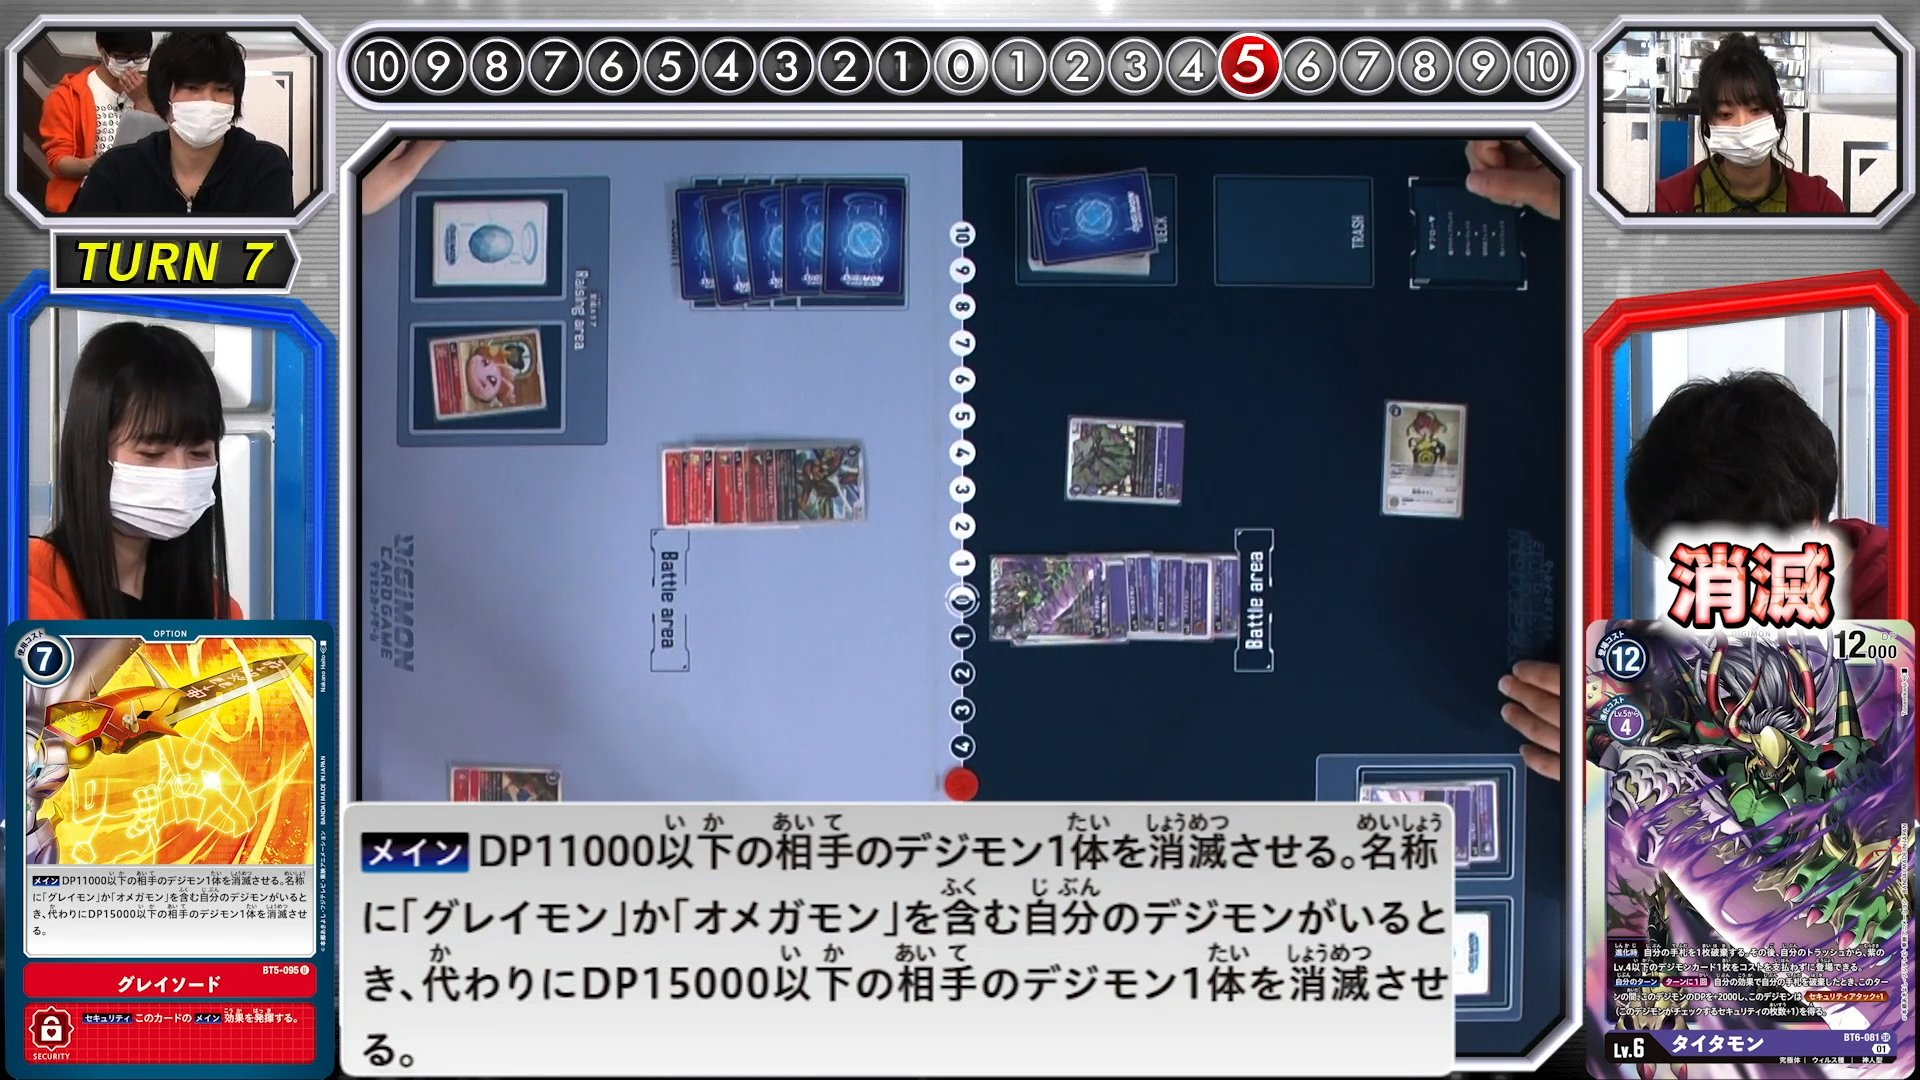 digimoncardbattle_v2_30_04_may20_2021.jpg